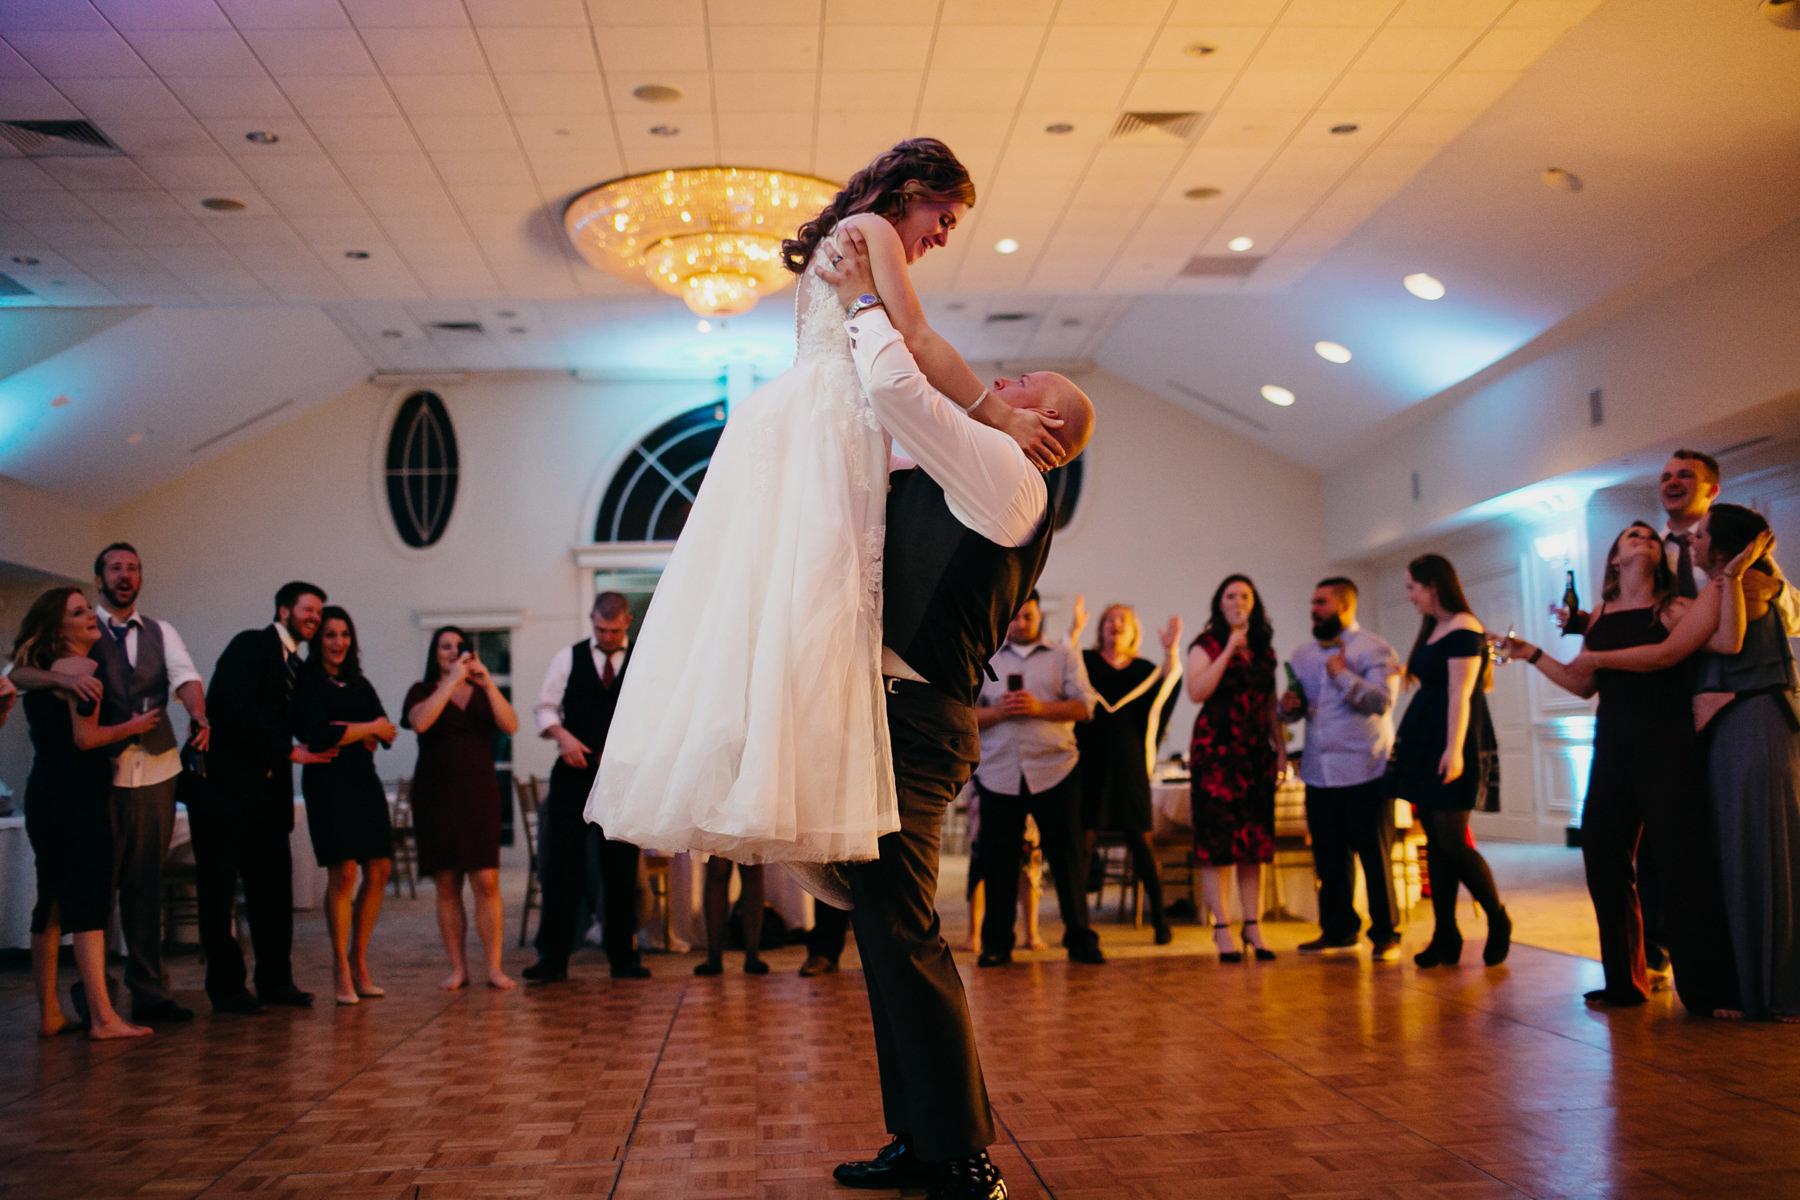 Quincy Ma Massachusetts Wedding Dedham Boston Granie Links Wedding New England Catholic Cathedral Liz Osban Photography 144.jpg